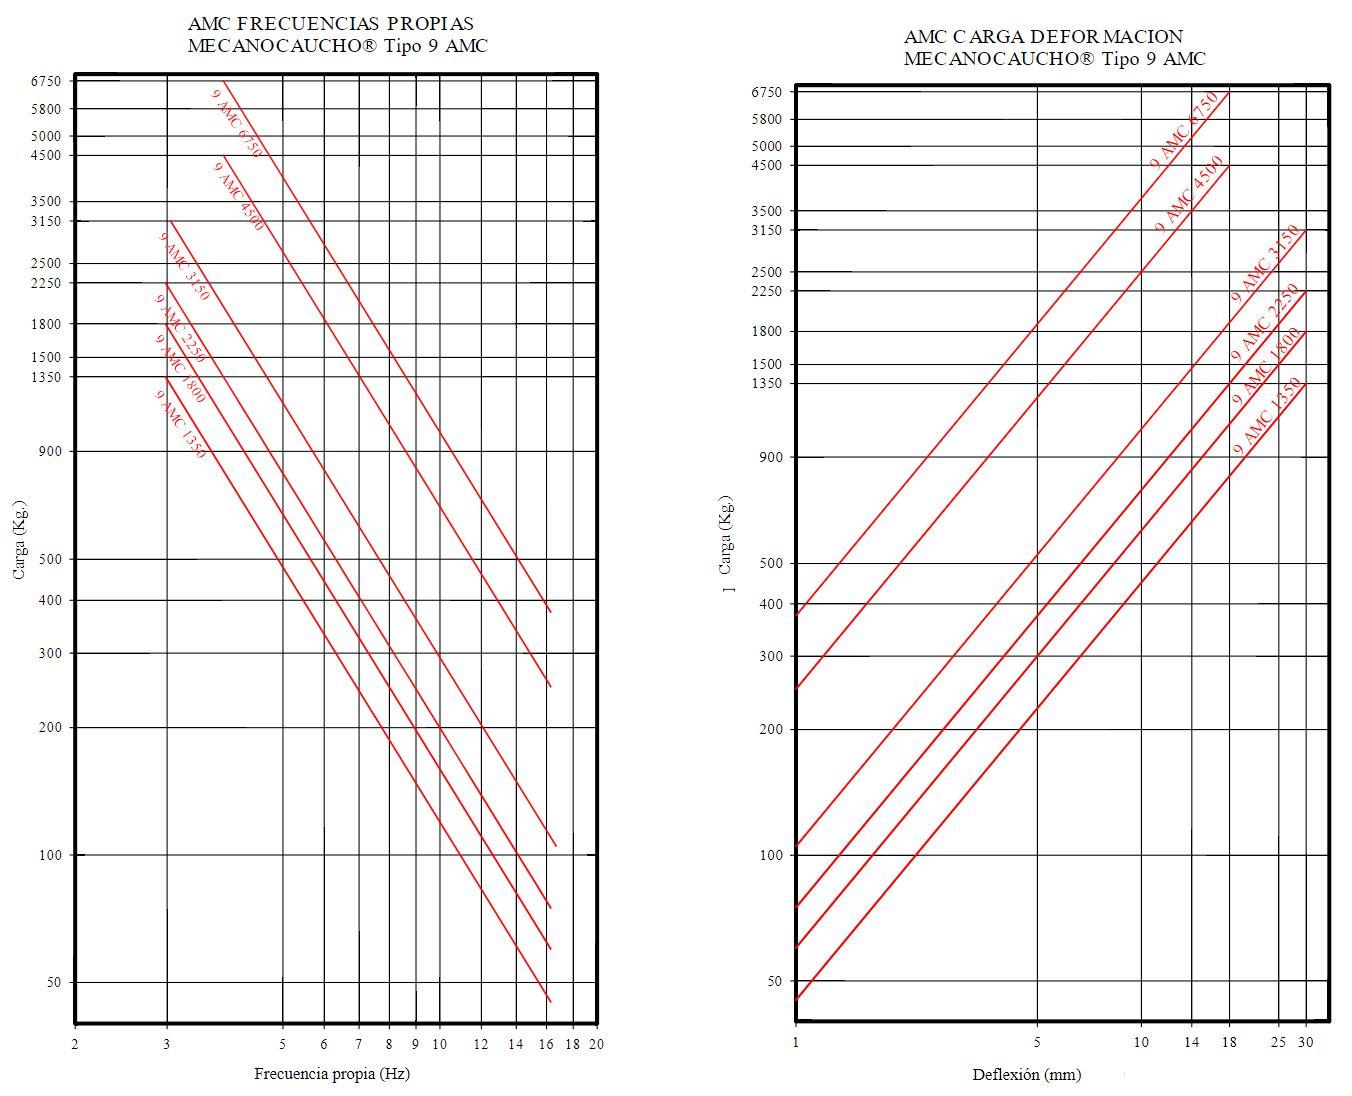 9 AMC curve